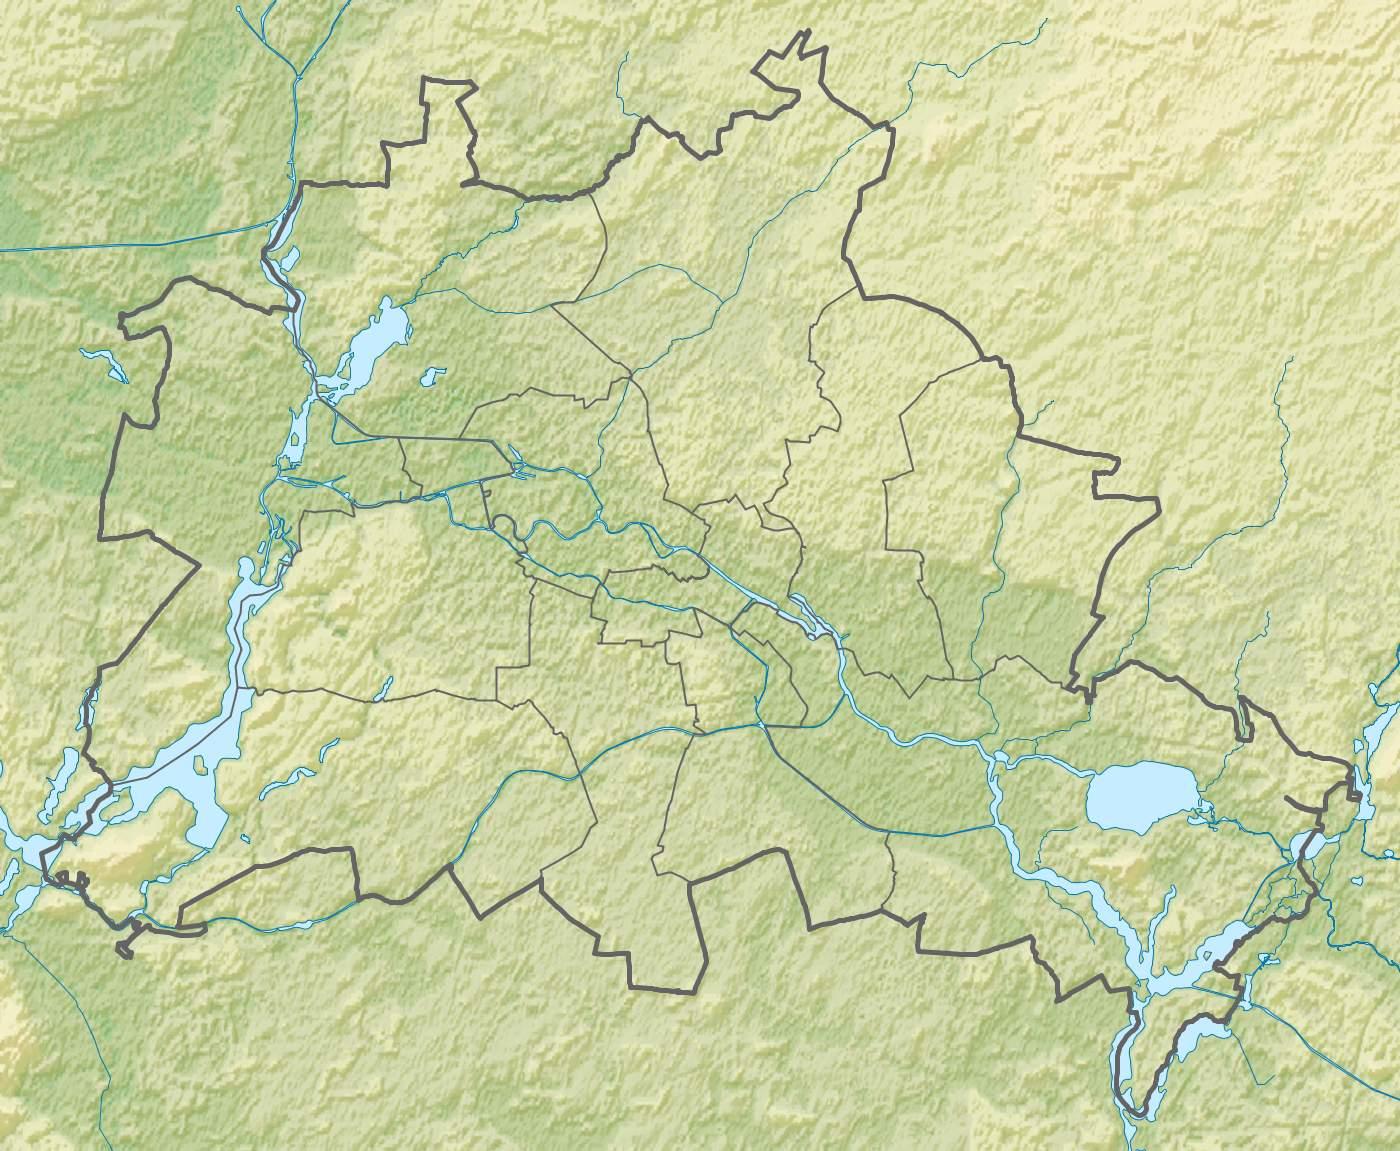 Berlin relief location map